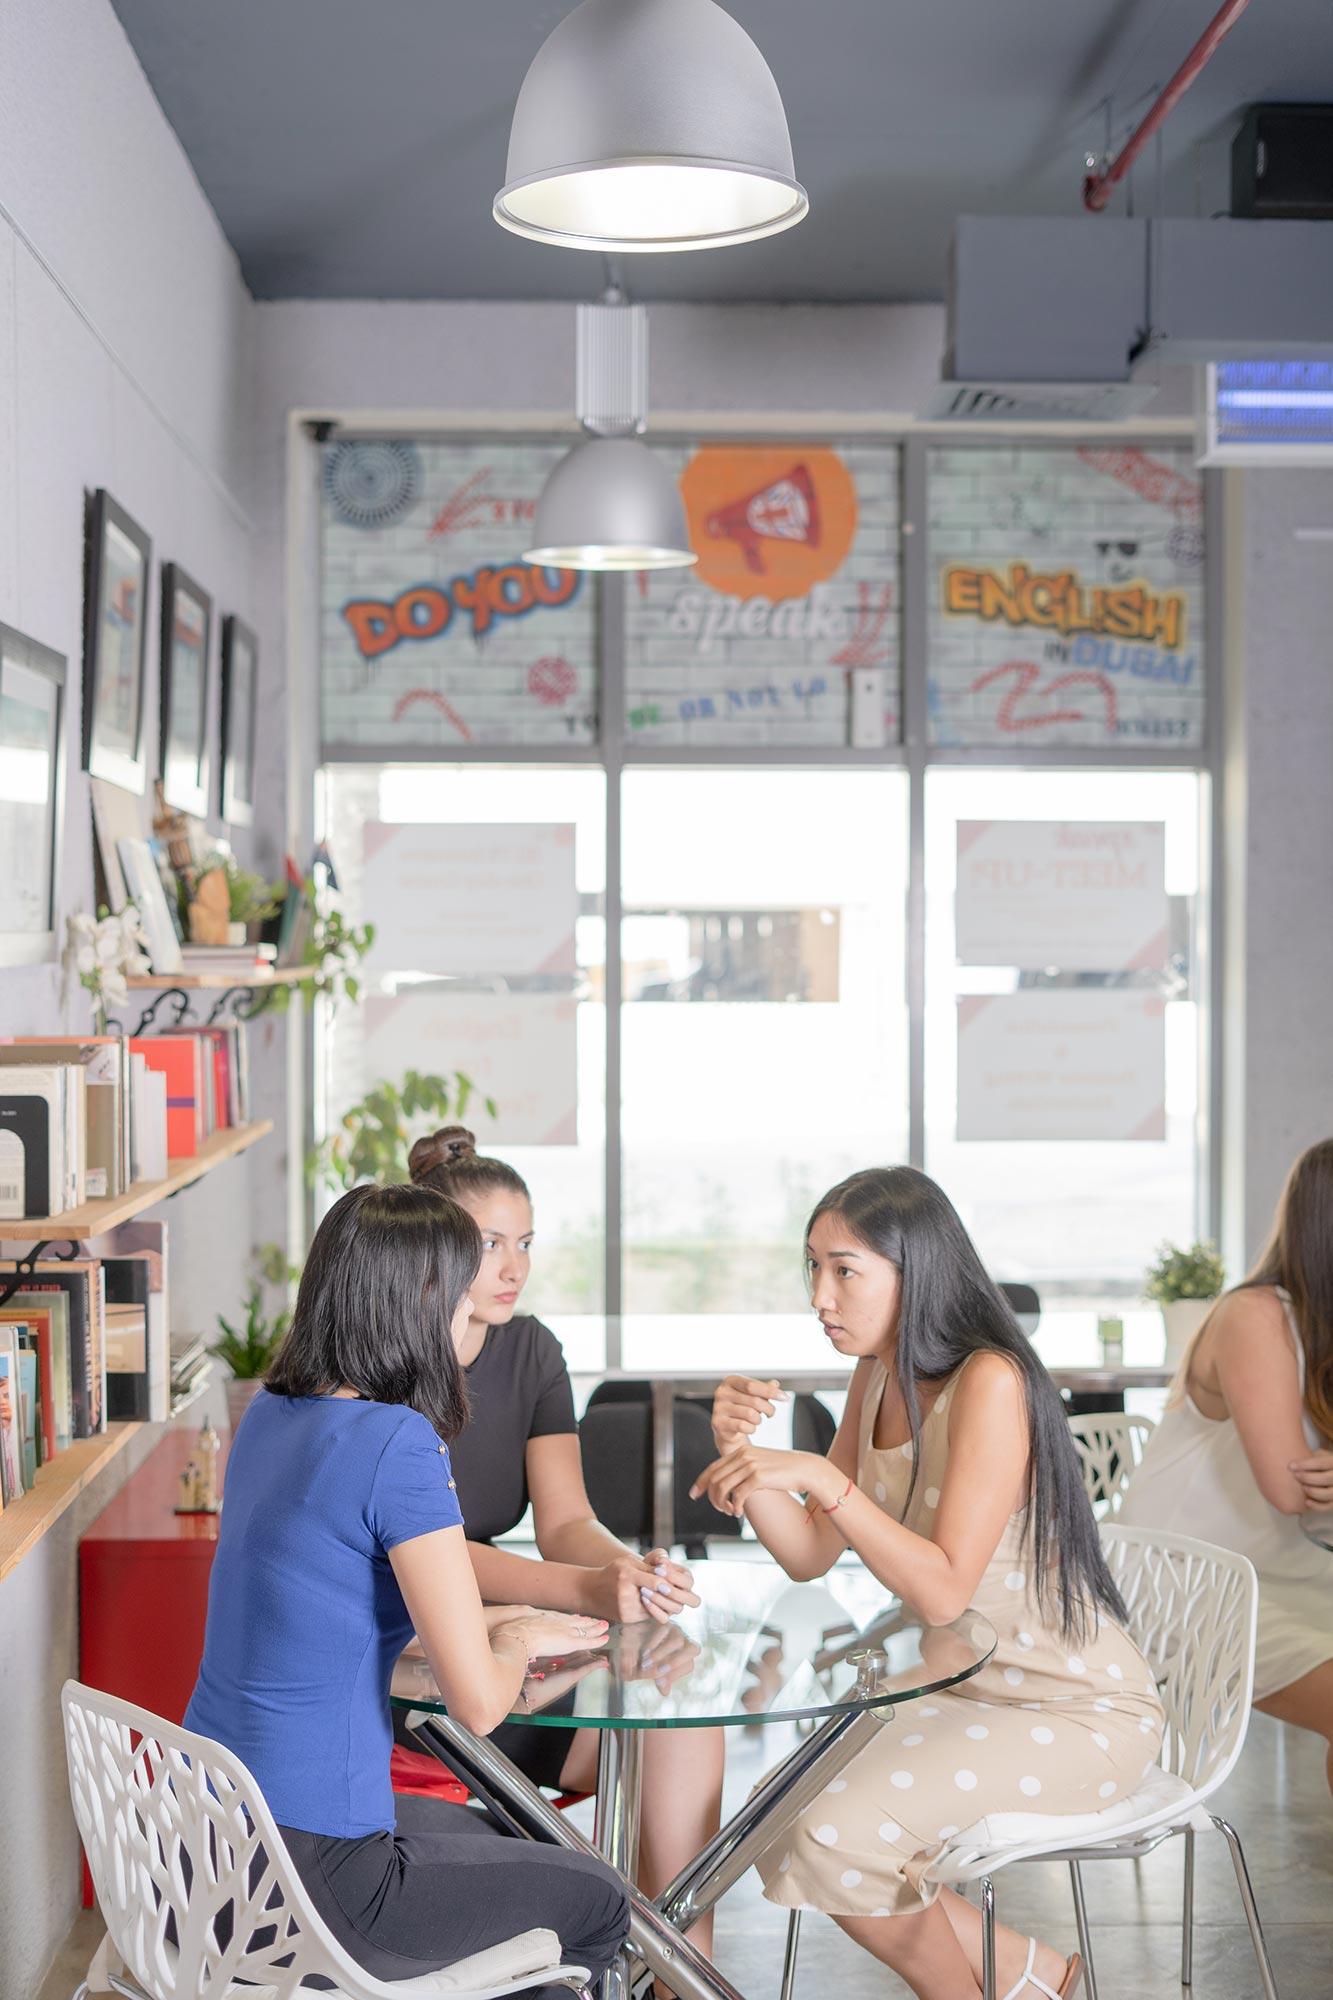 English students sitting at a table at Speak Dubai